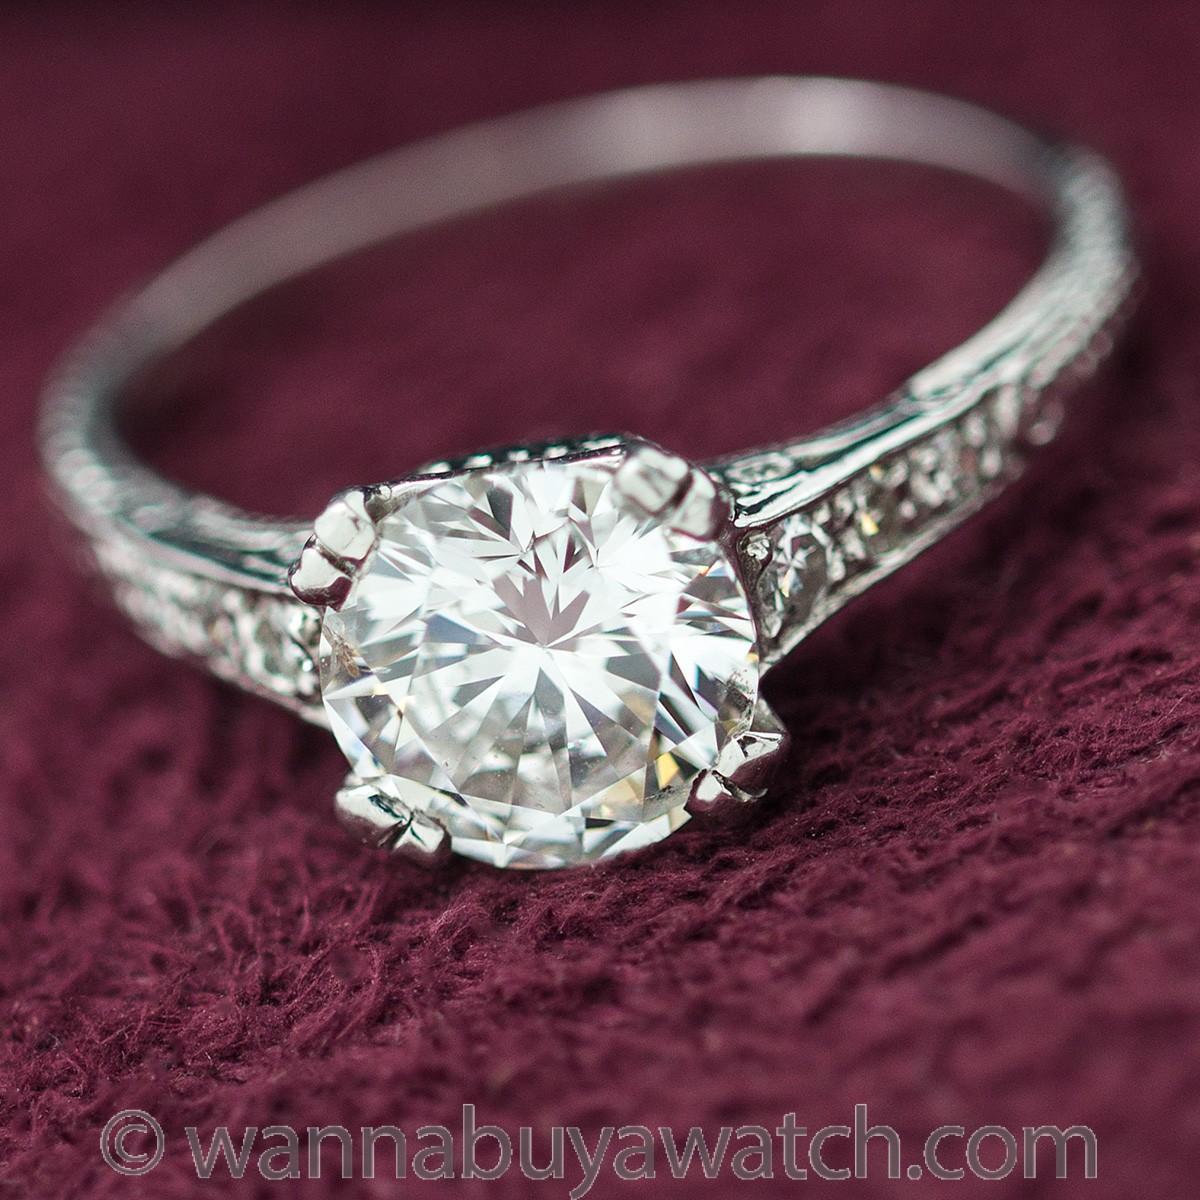 Vintage Inspired Platinum Engagement Ring 1.52ct Round Brilliant H-SI2